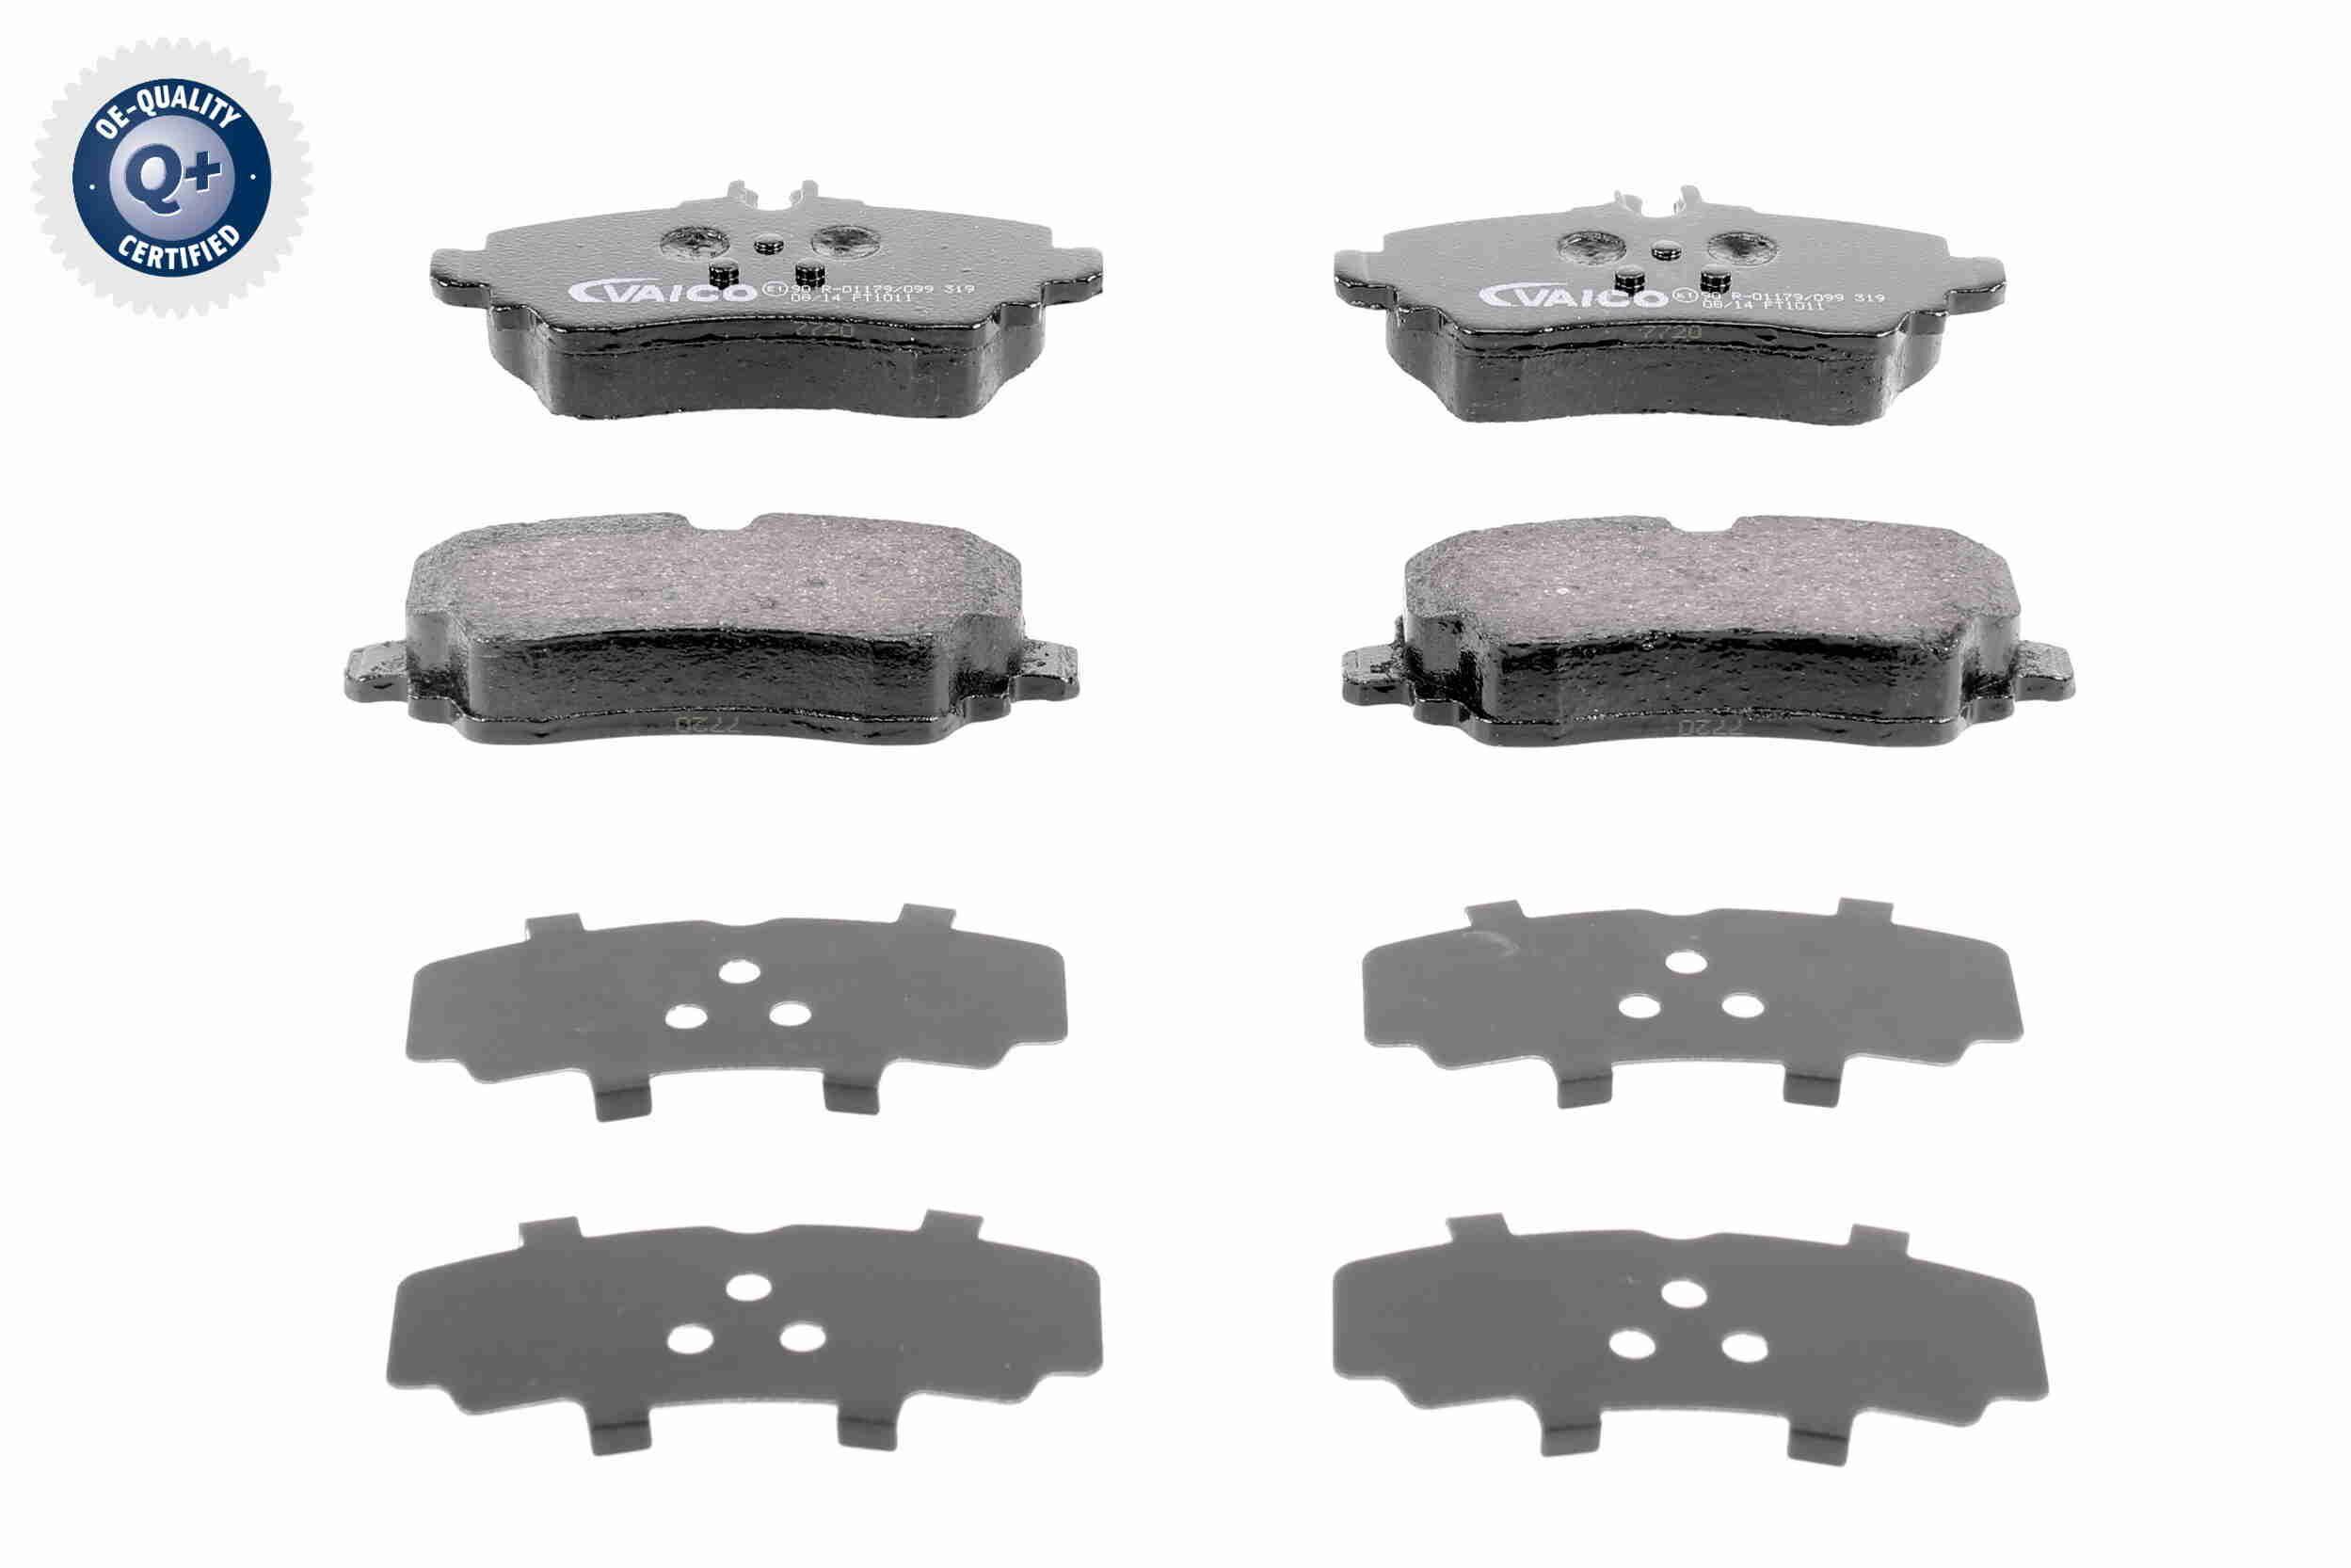 Bremsbelagsatz VAICO V30-8142